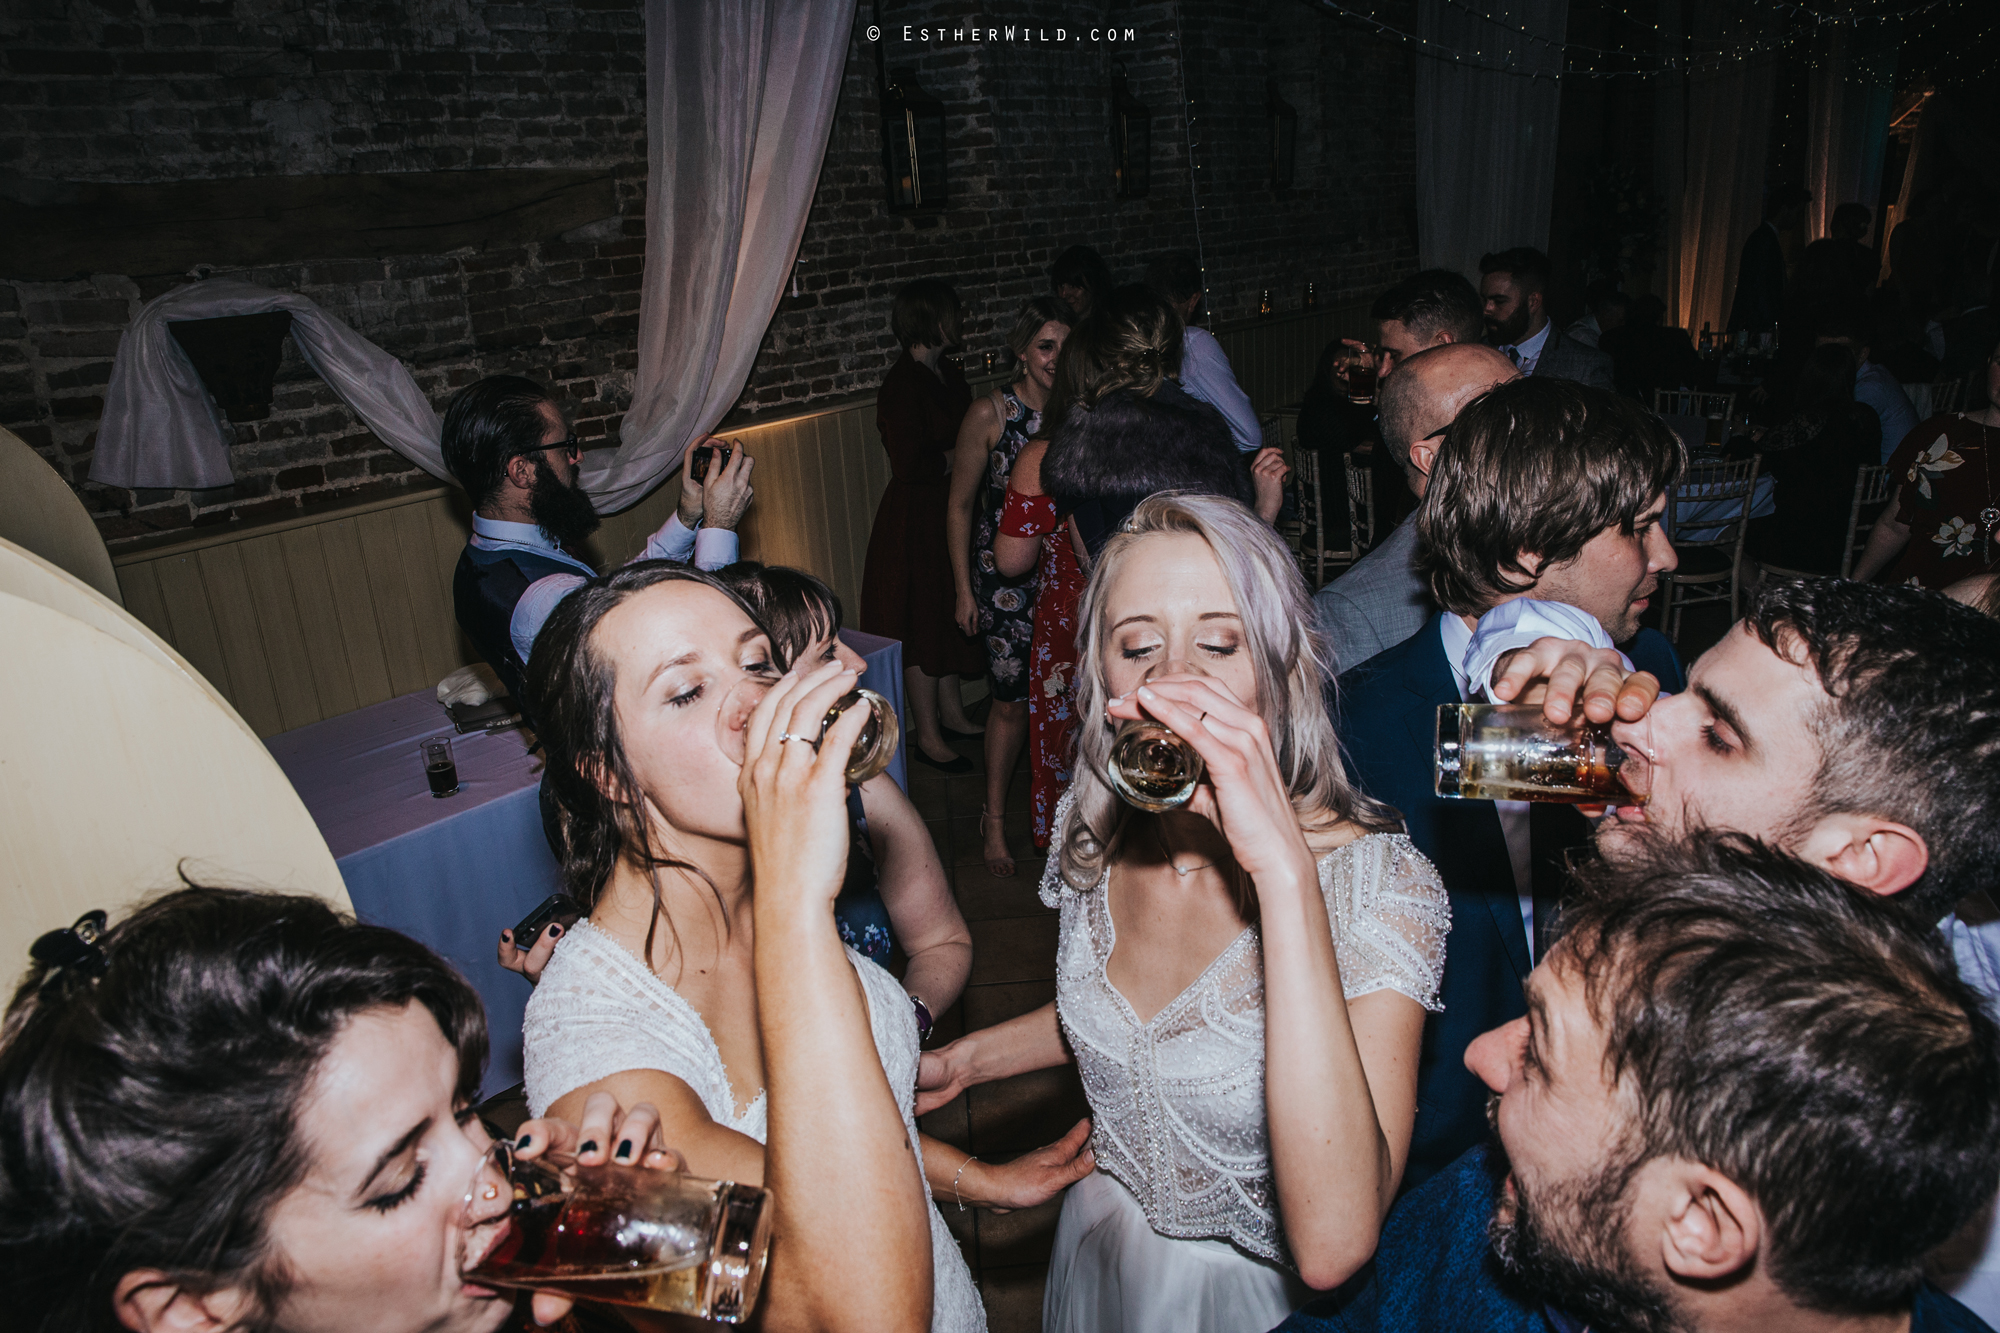 Elms_Barn_Weddings_Suffolk_Photographer_Copyright_Esther_Wild_IMG_3740.jpg